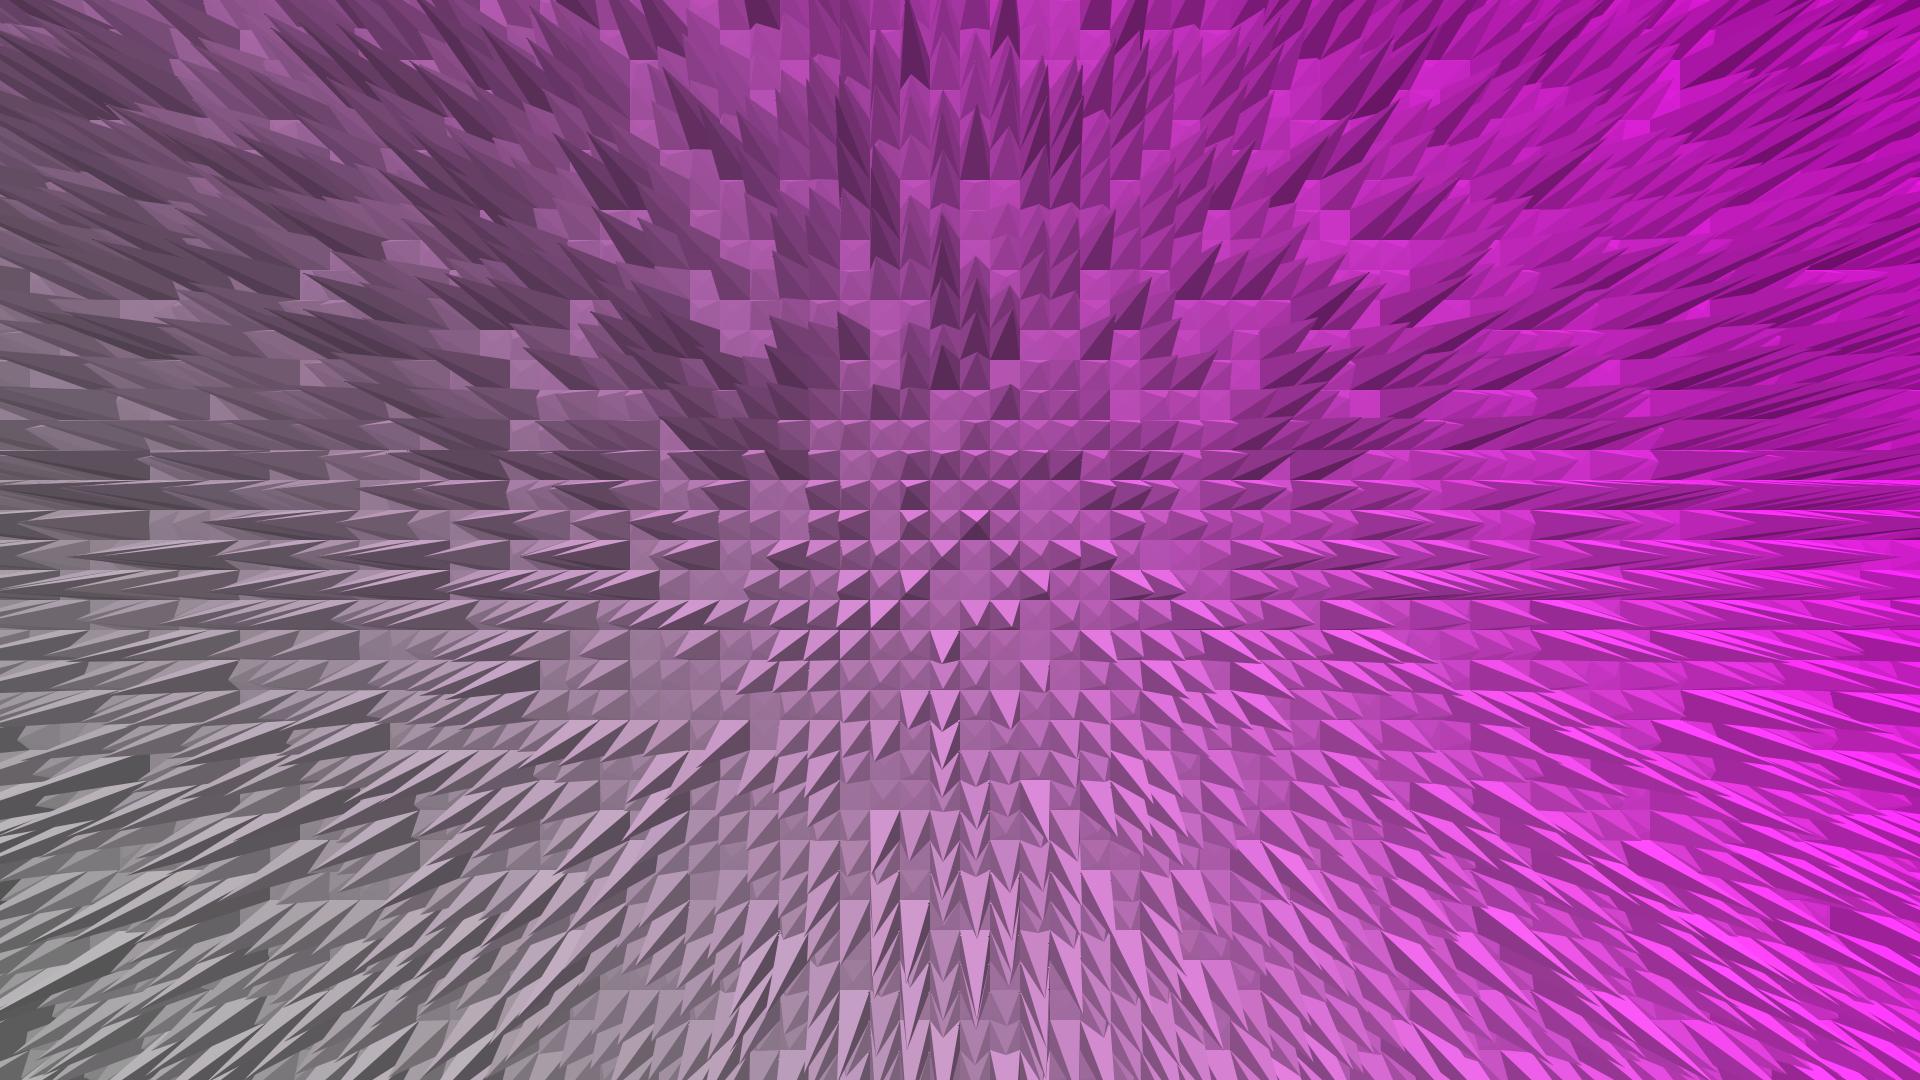 Unduh Kumpulan Wallpaper 3d Pink  Gratis